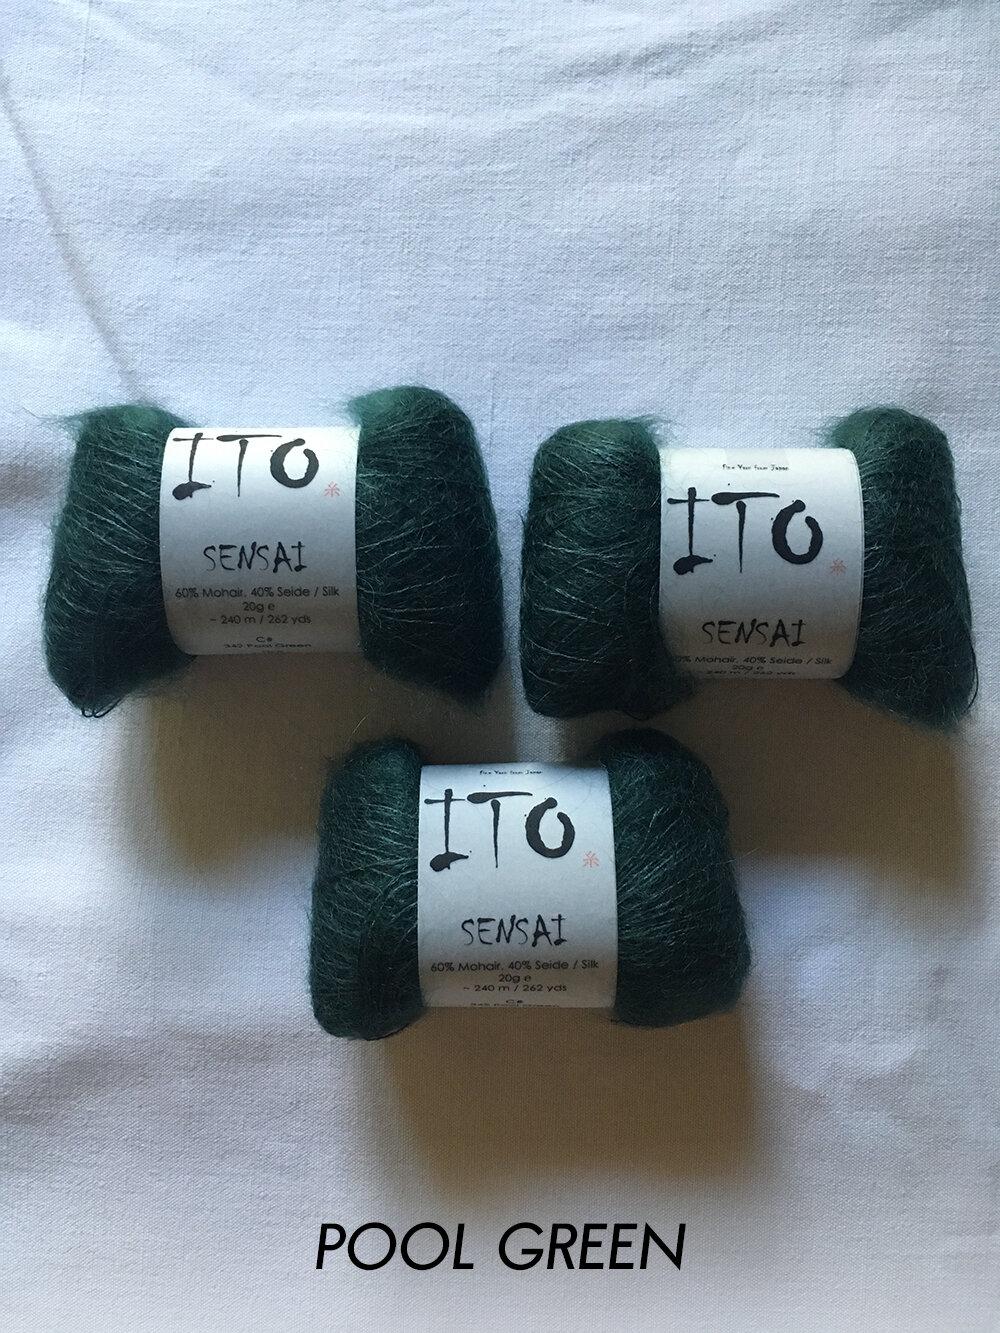 ito_sensai_pool_green_342_wool_done_knitting.jpg